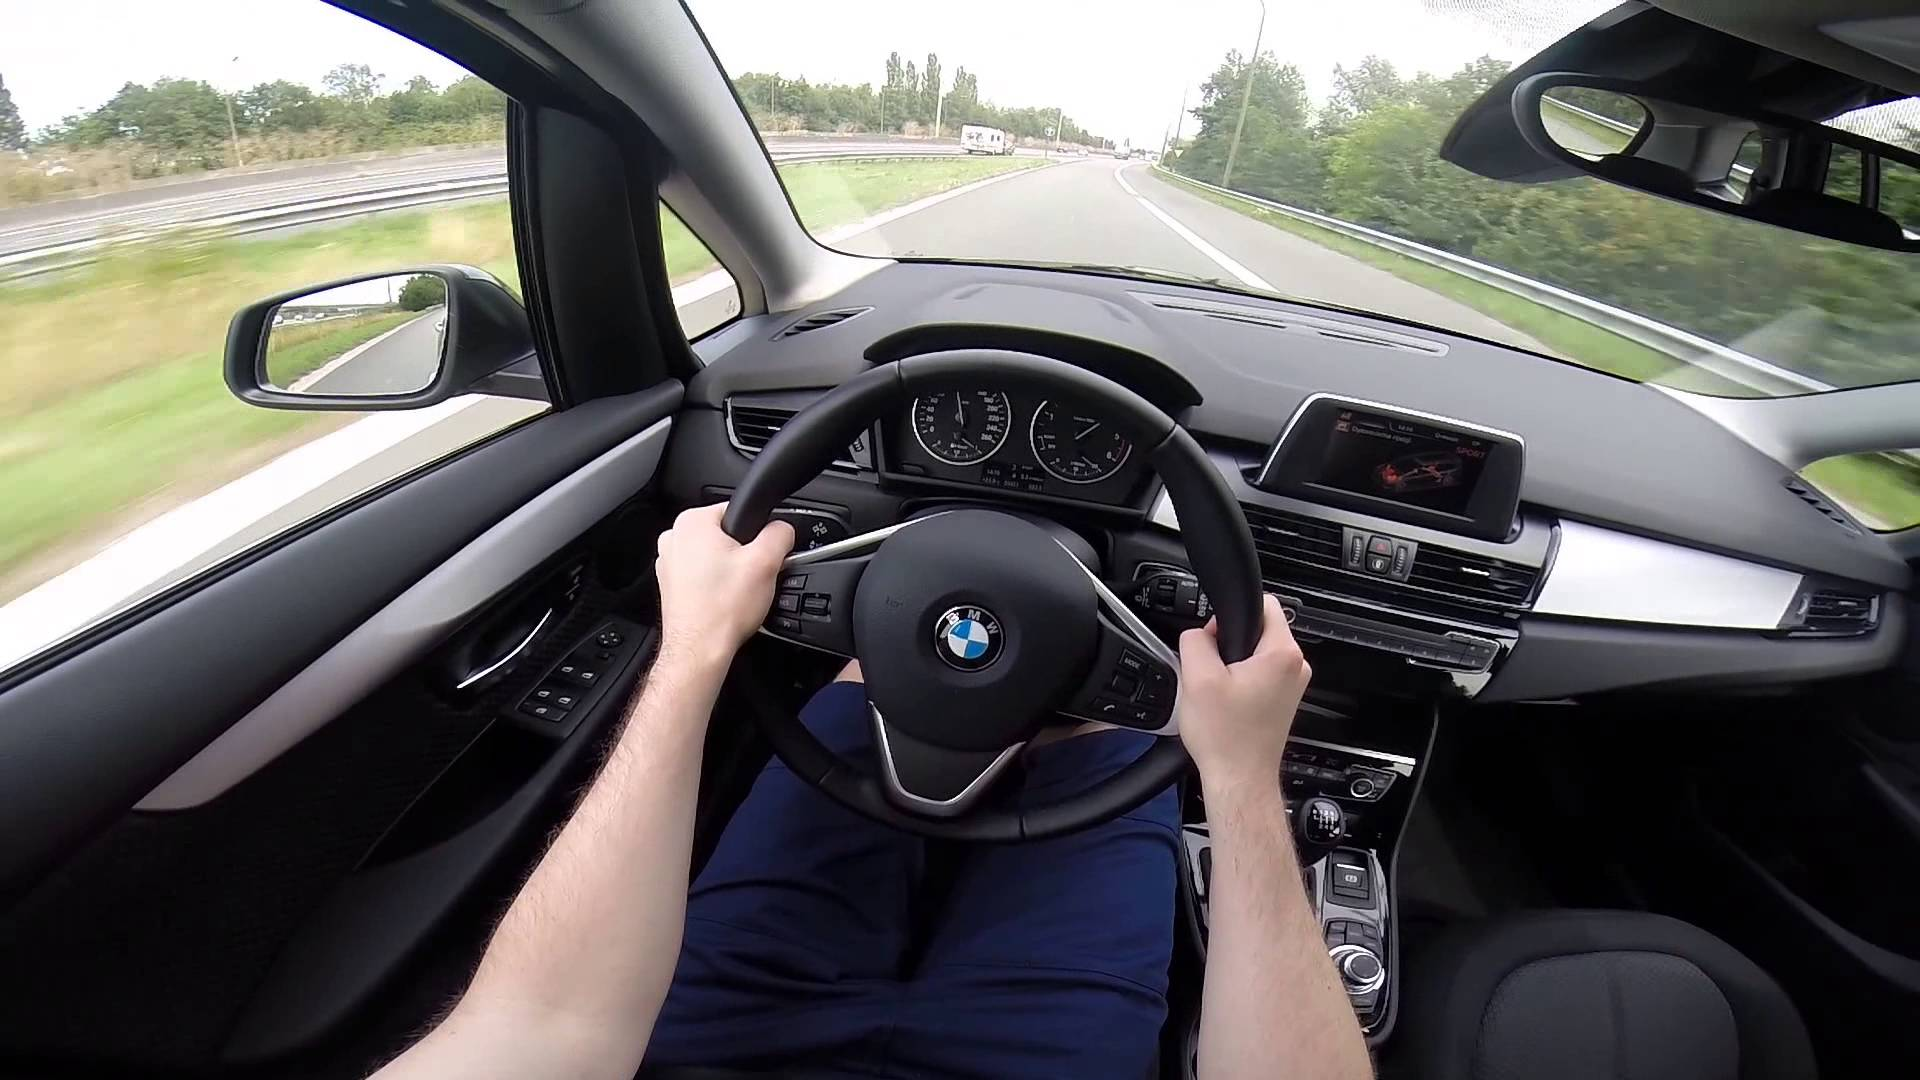 2020 BMW 2 Series Gran Tourer Spy Shots